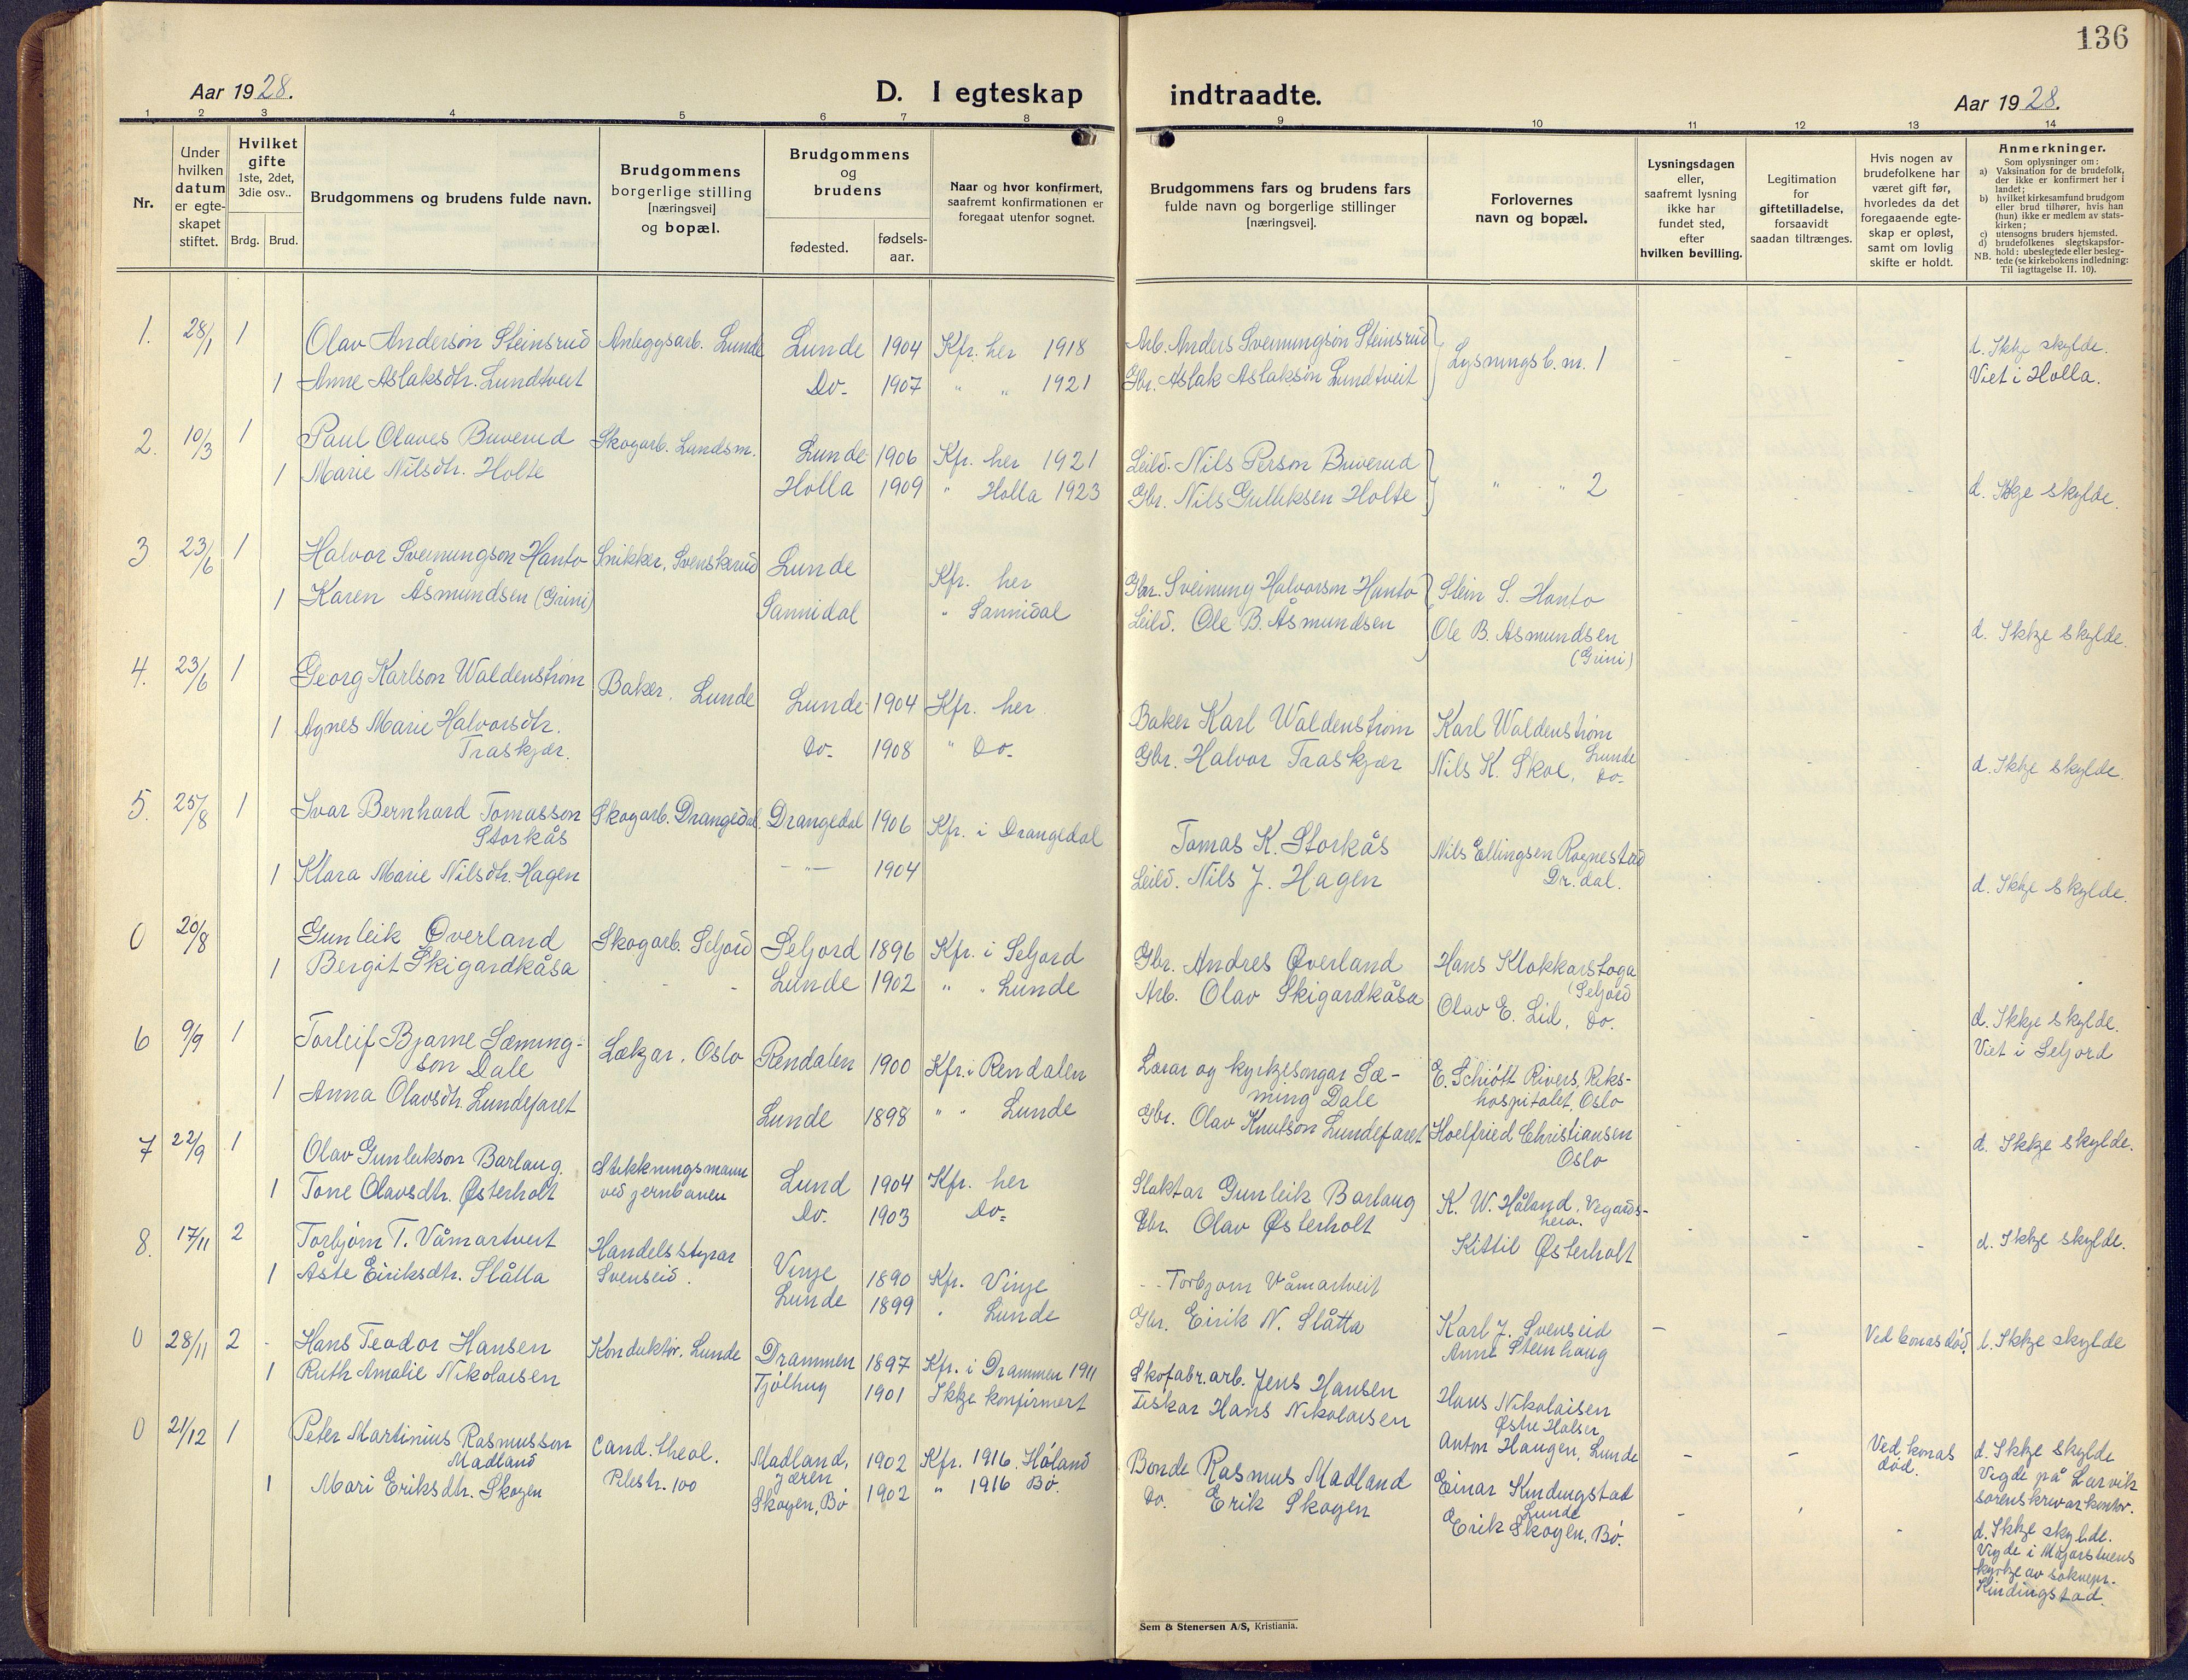 SAKO, Lunde kirkebøker, F/Fa/L0006: Ministerialbok nr. I 6, 1922-1940, s. 136